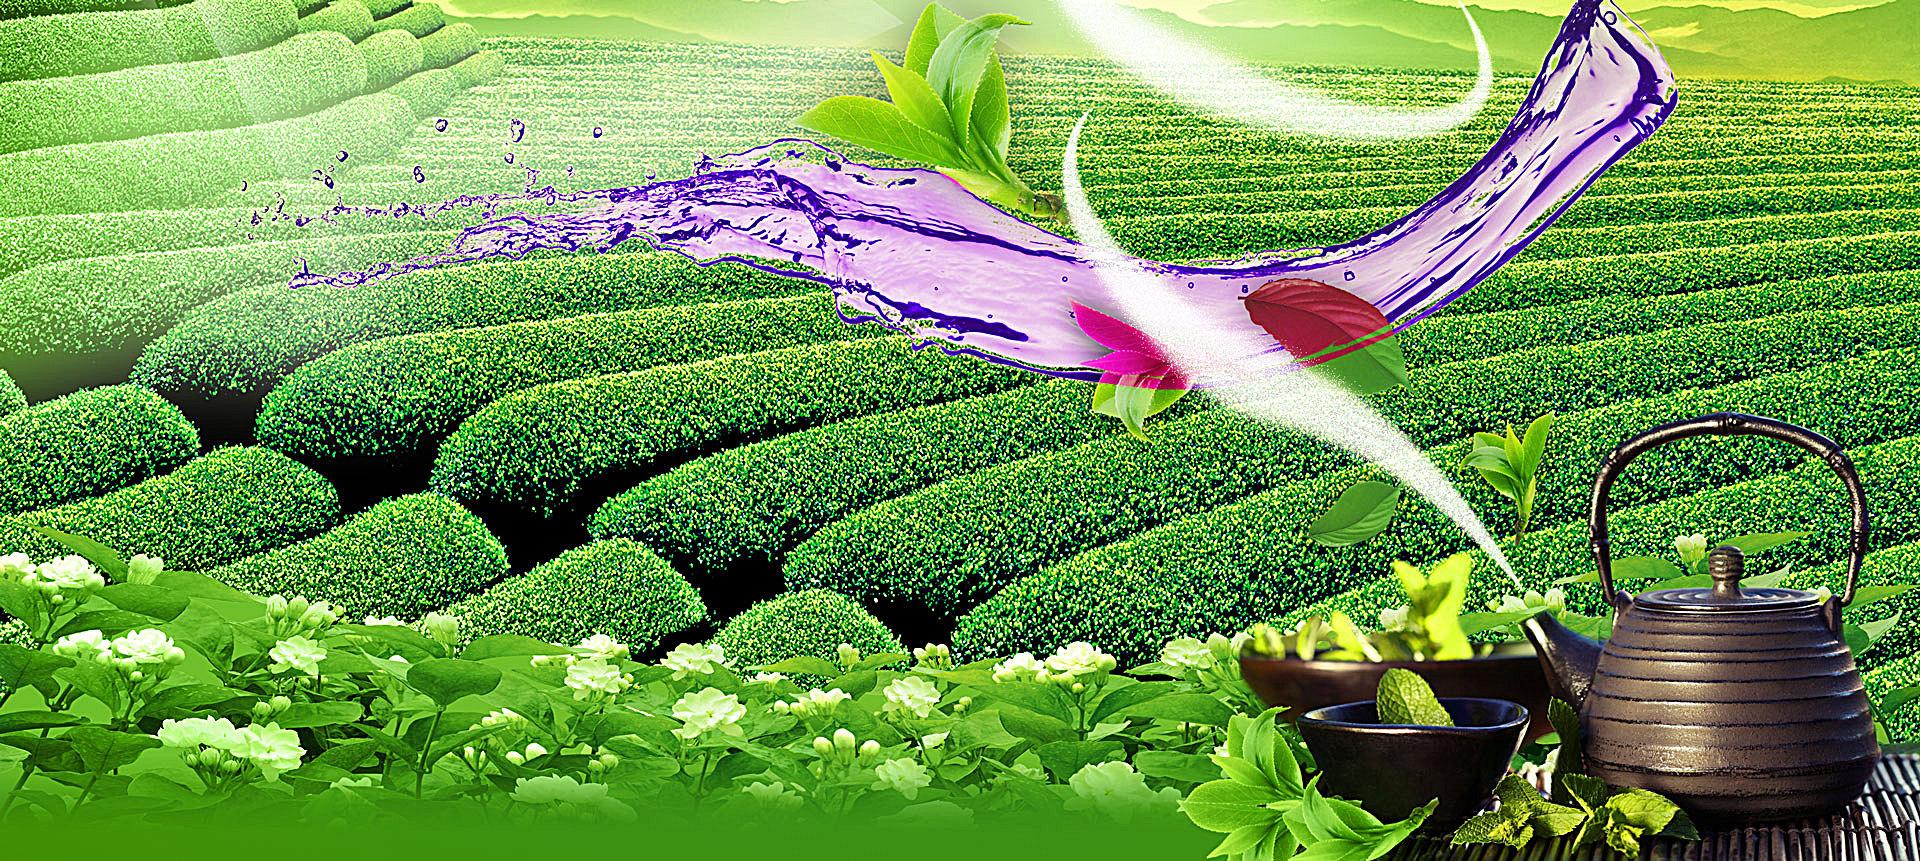 Planta acuática planta acuática plantas vasculares Natural Jardin ...